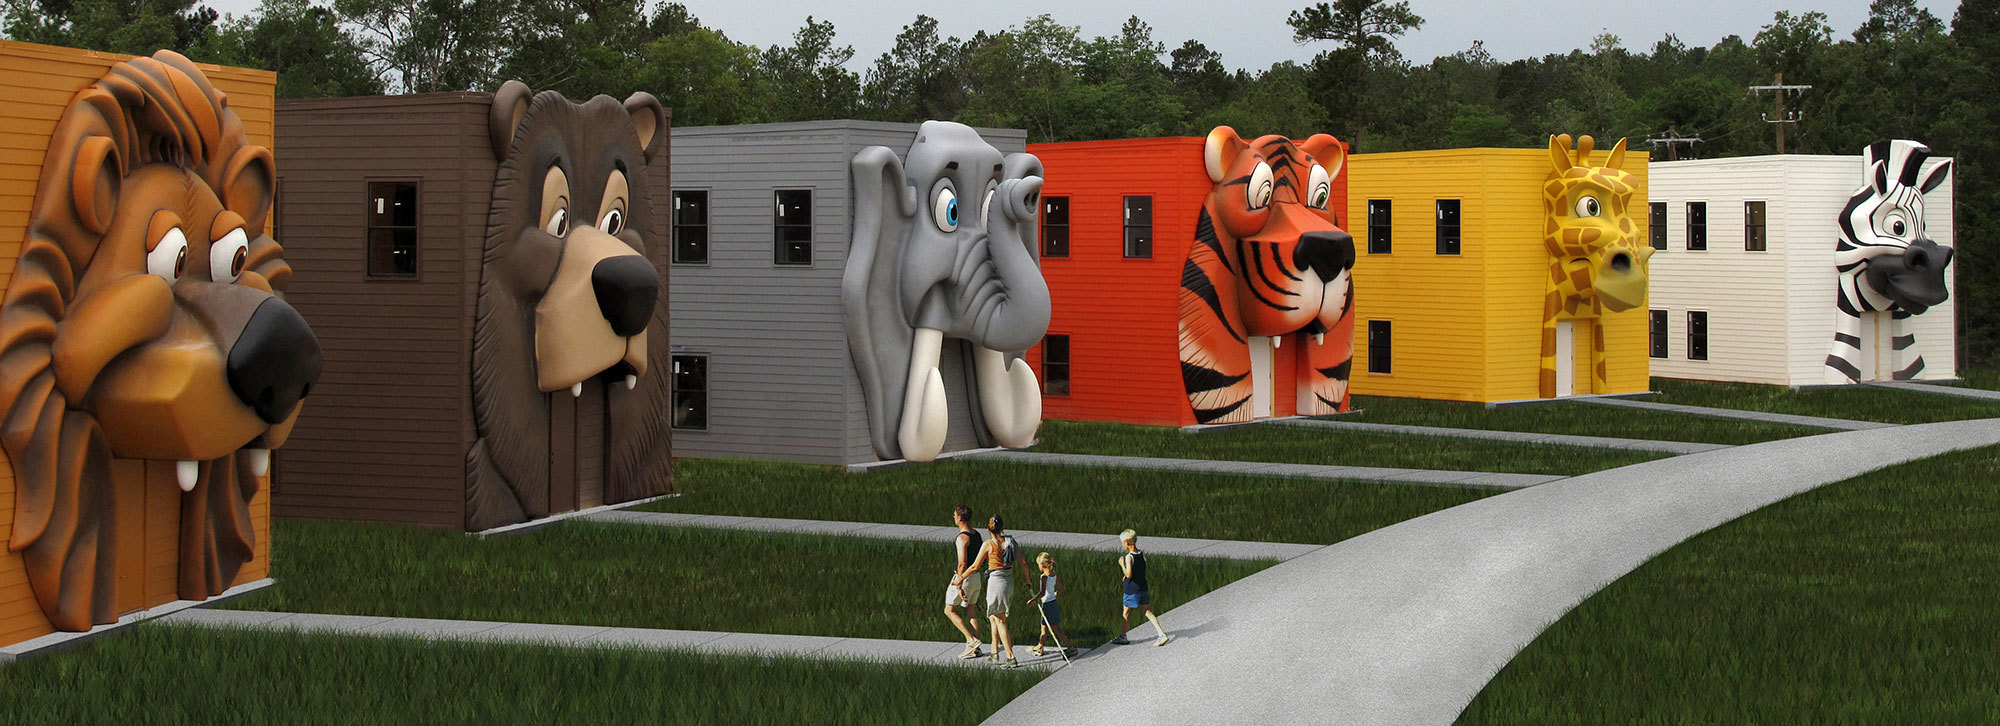 Giant Animal Face Camp Cabin Fascades at Carolina Creek Christian Camp